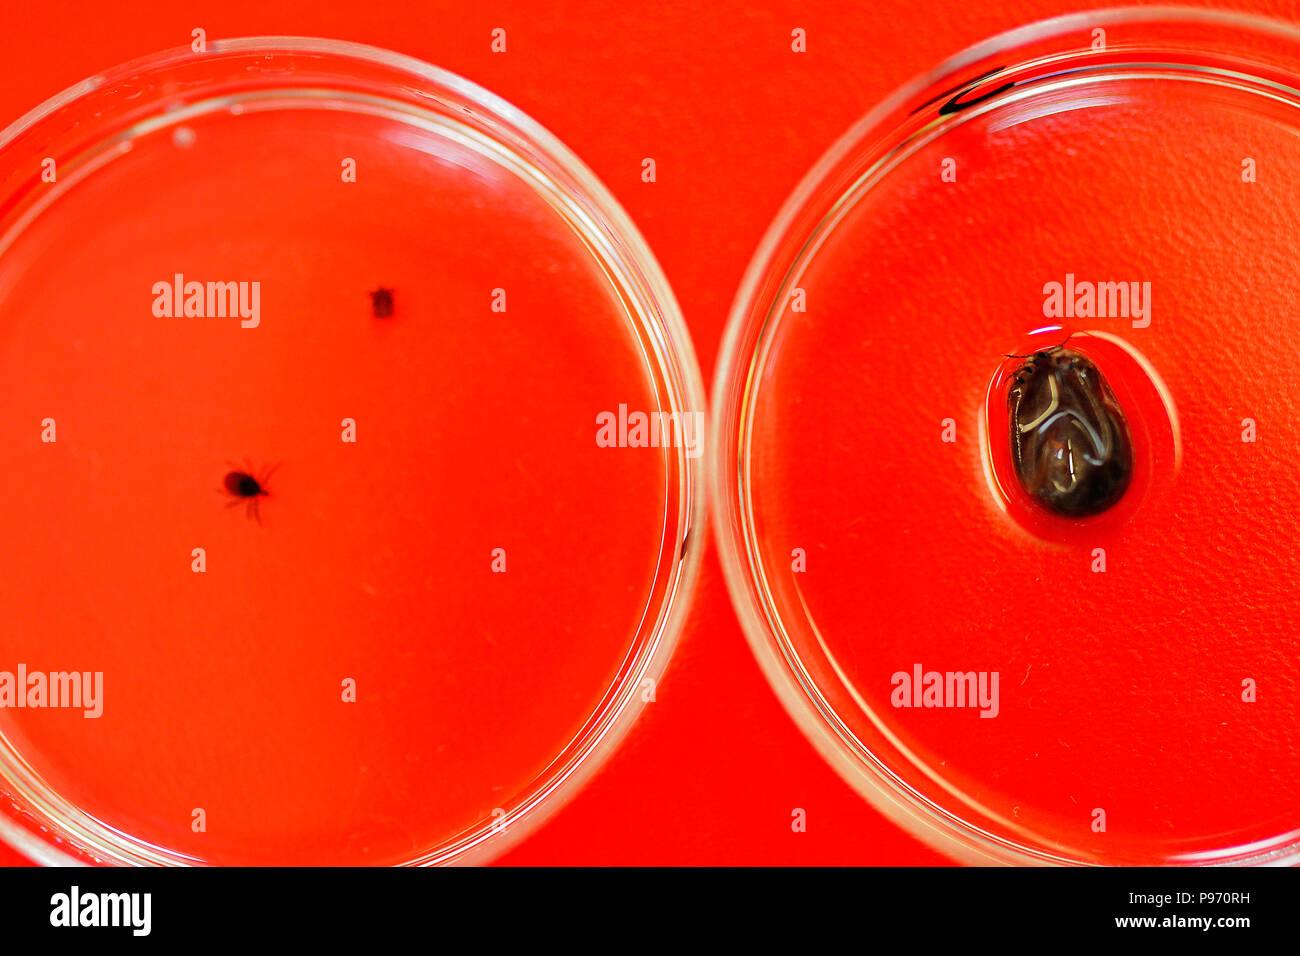 Germany, North Rhine-Westphalia - Chemical Veterinary Examination Office in Krefeld - Stock Image